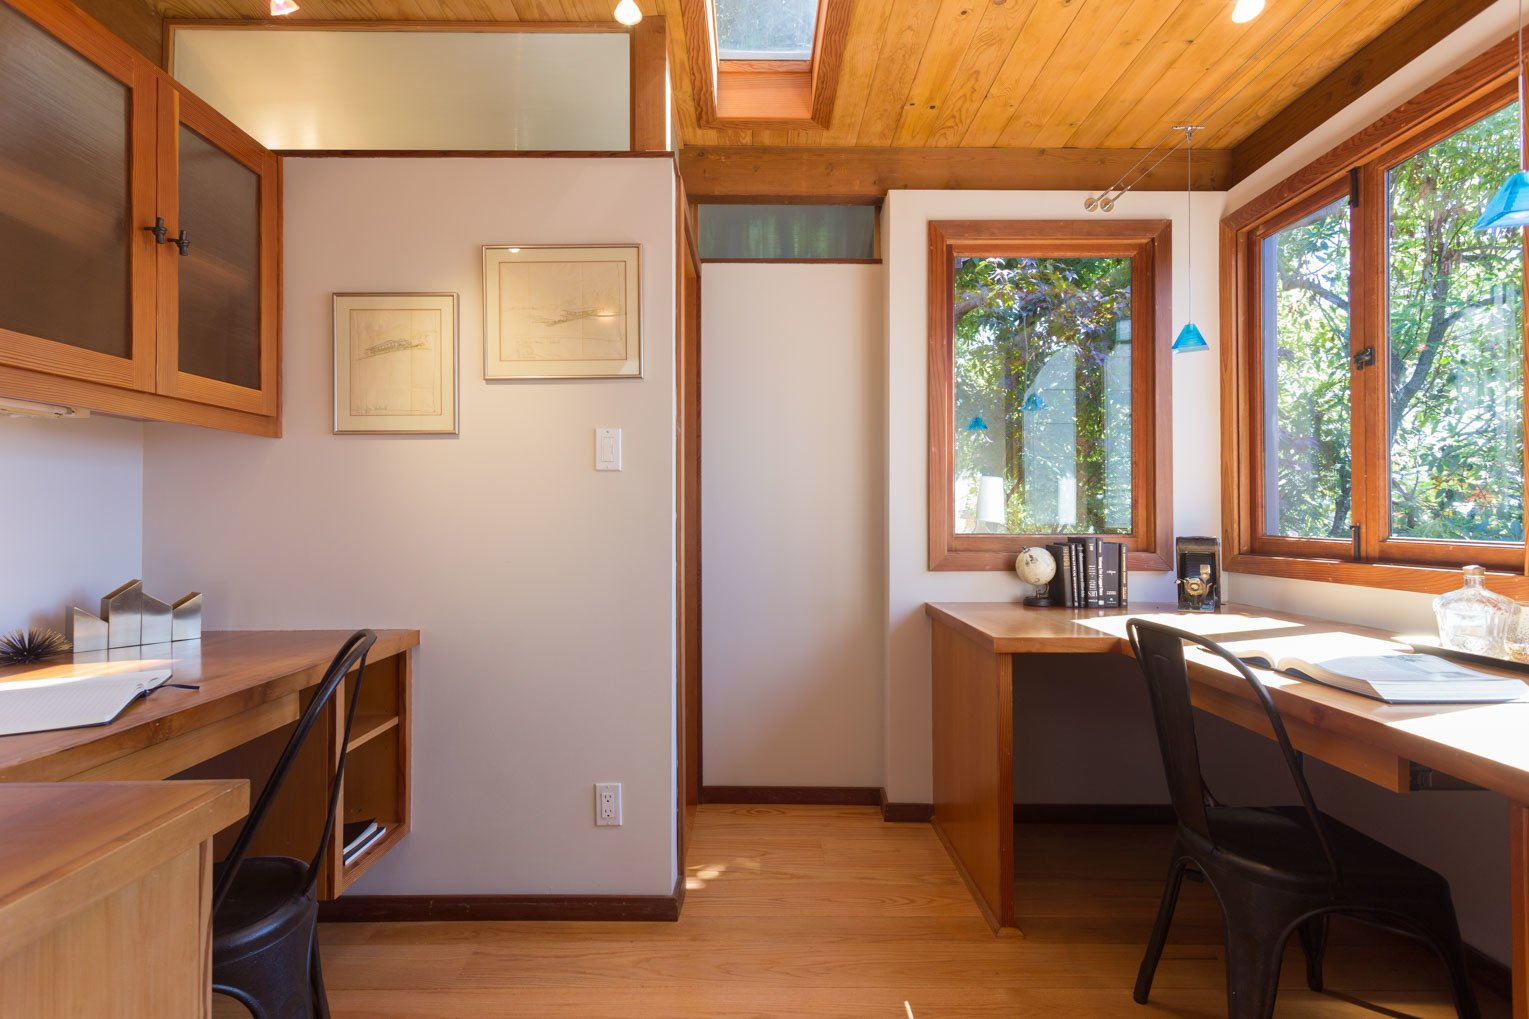 Office and Medium Hardwood Floor  Photos from Mid-Century Retreat in Berkeley